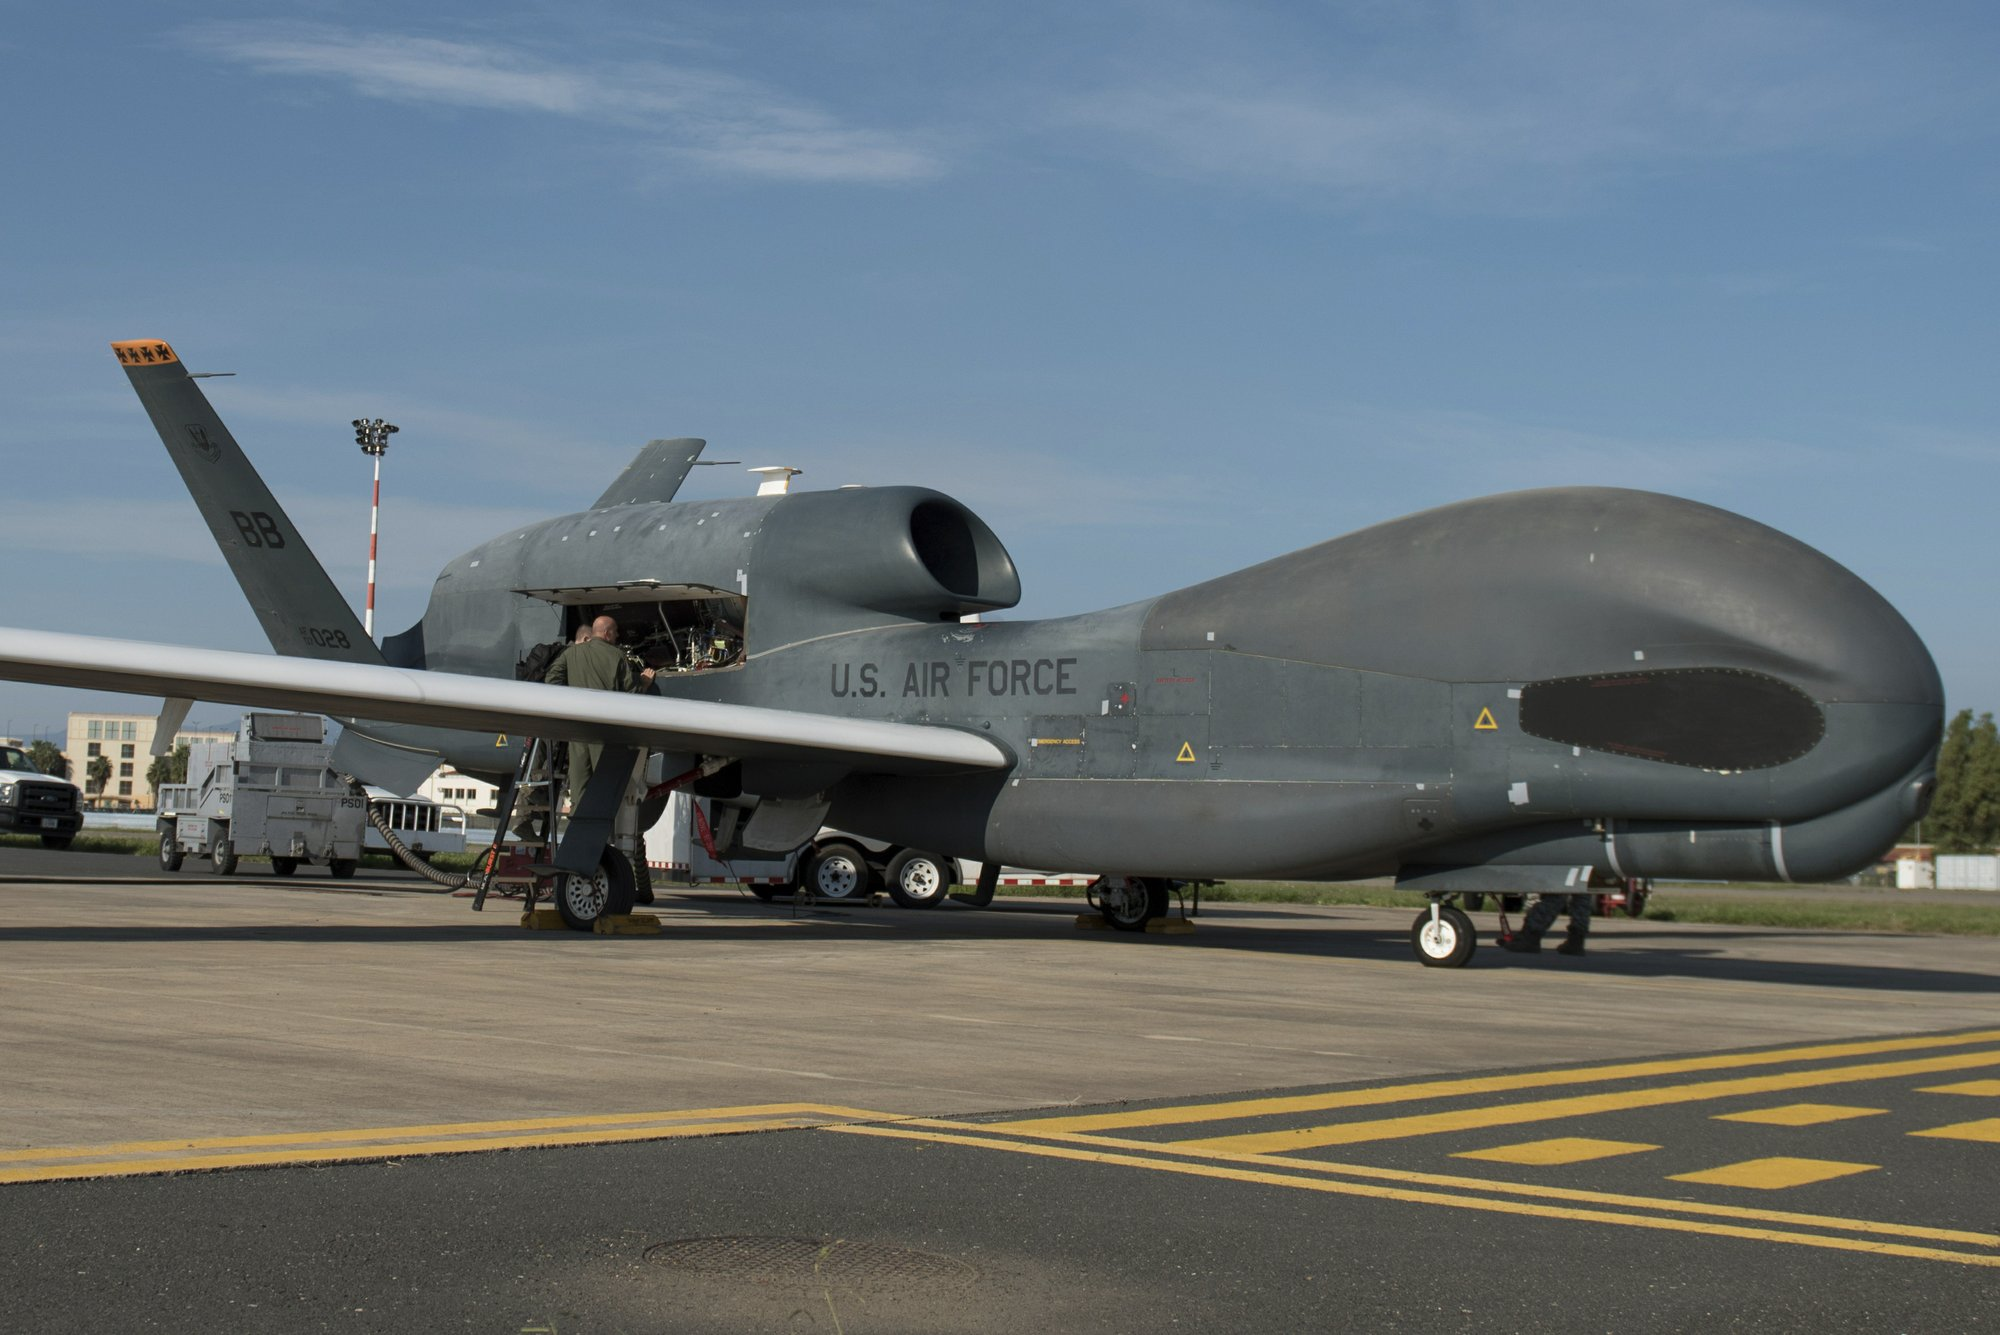 Iran shoots down US surveillance drone, heightening tensions